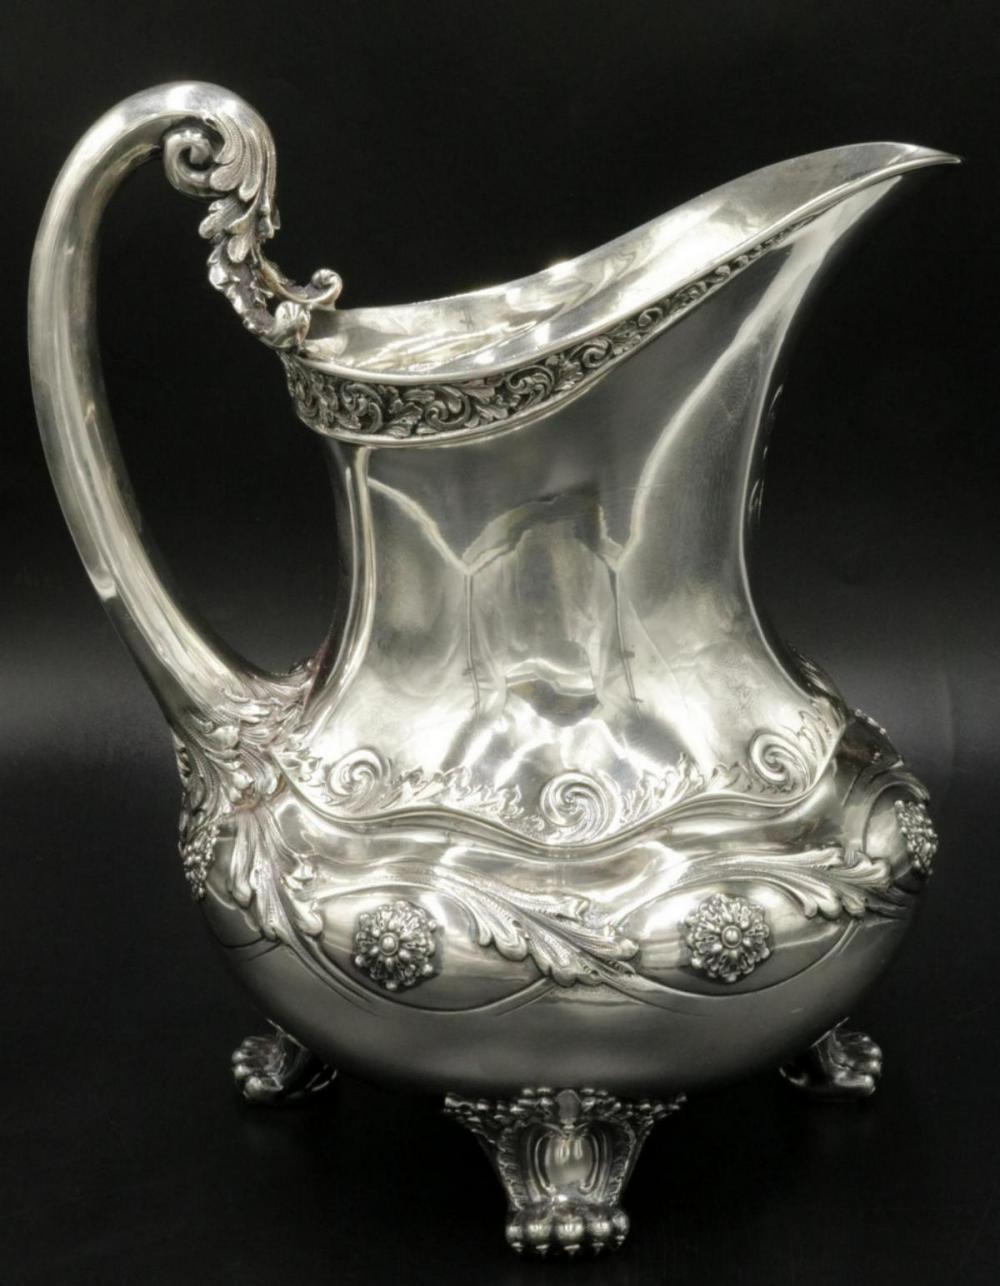 Rare Tiffany & Co. Sterling Silver Pitcher